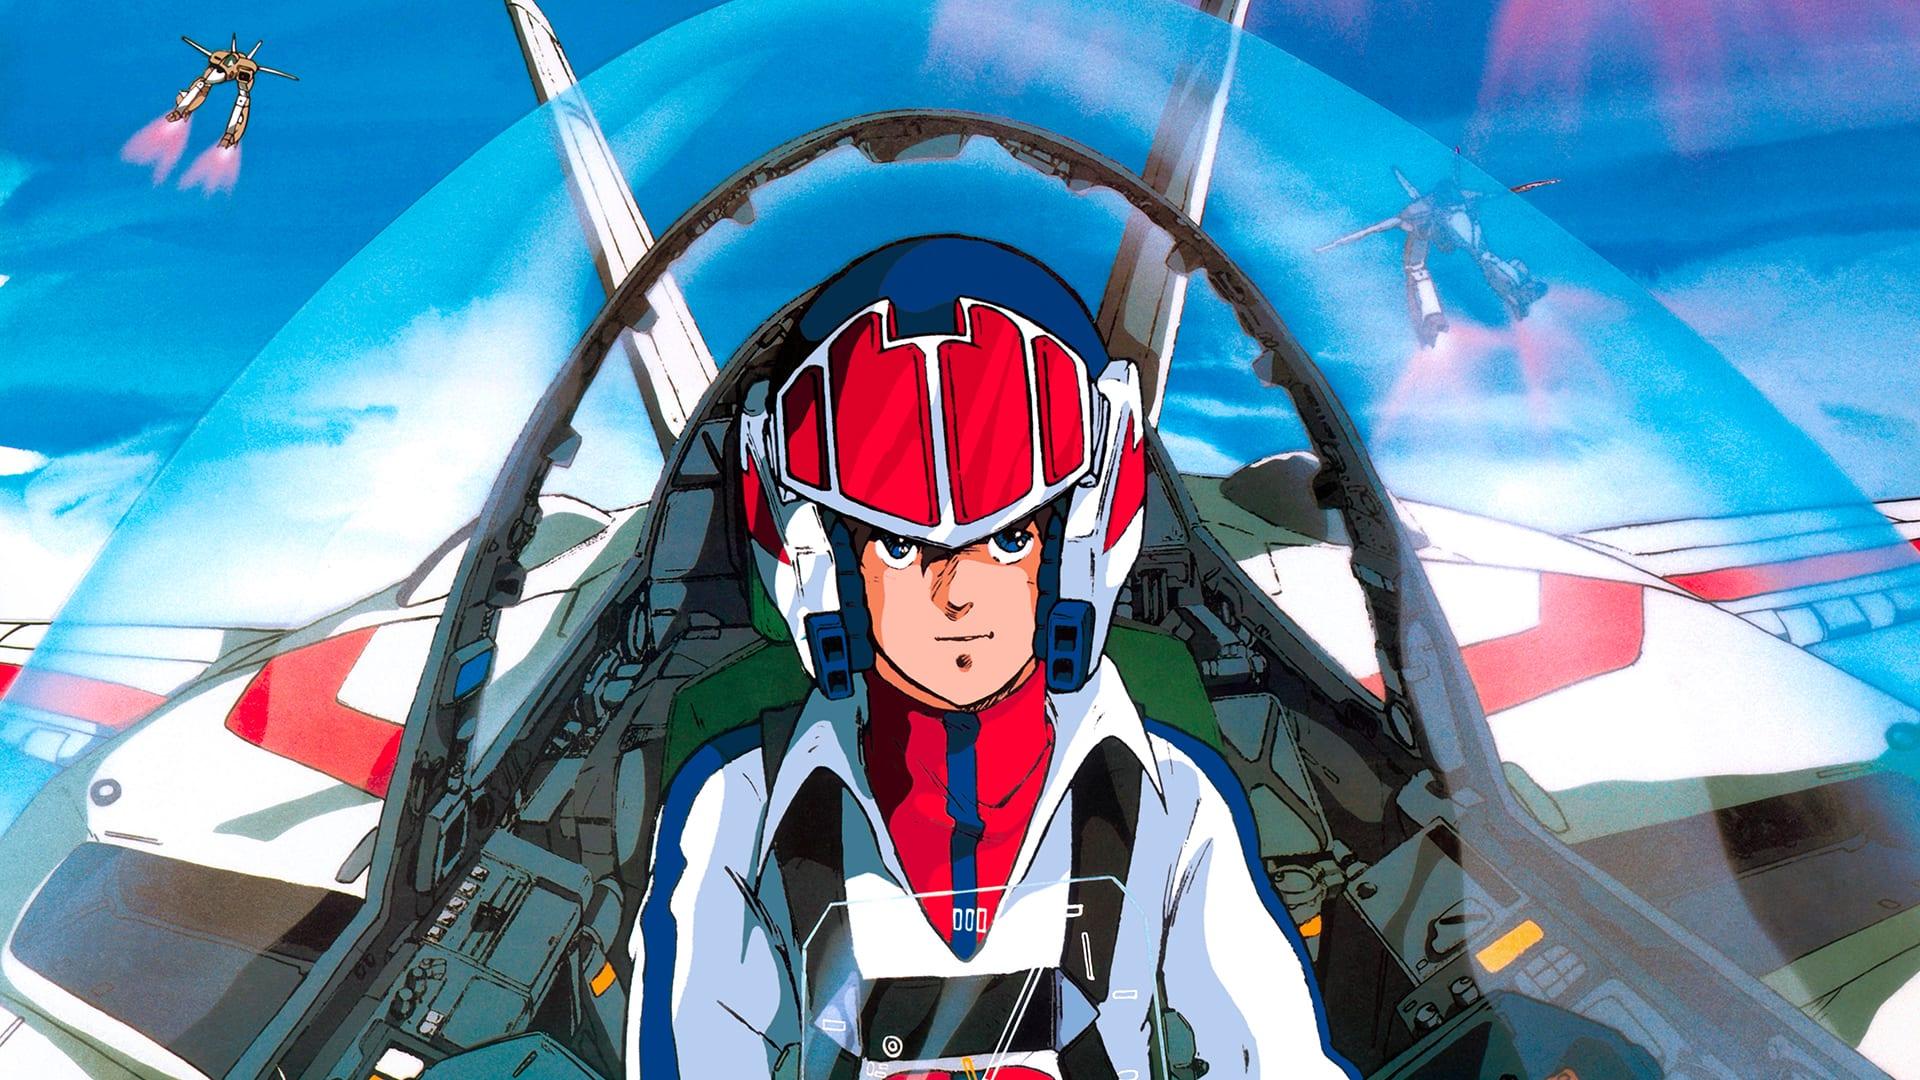 80s anime, Super Dimension Fortress Macross